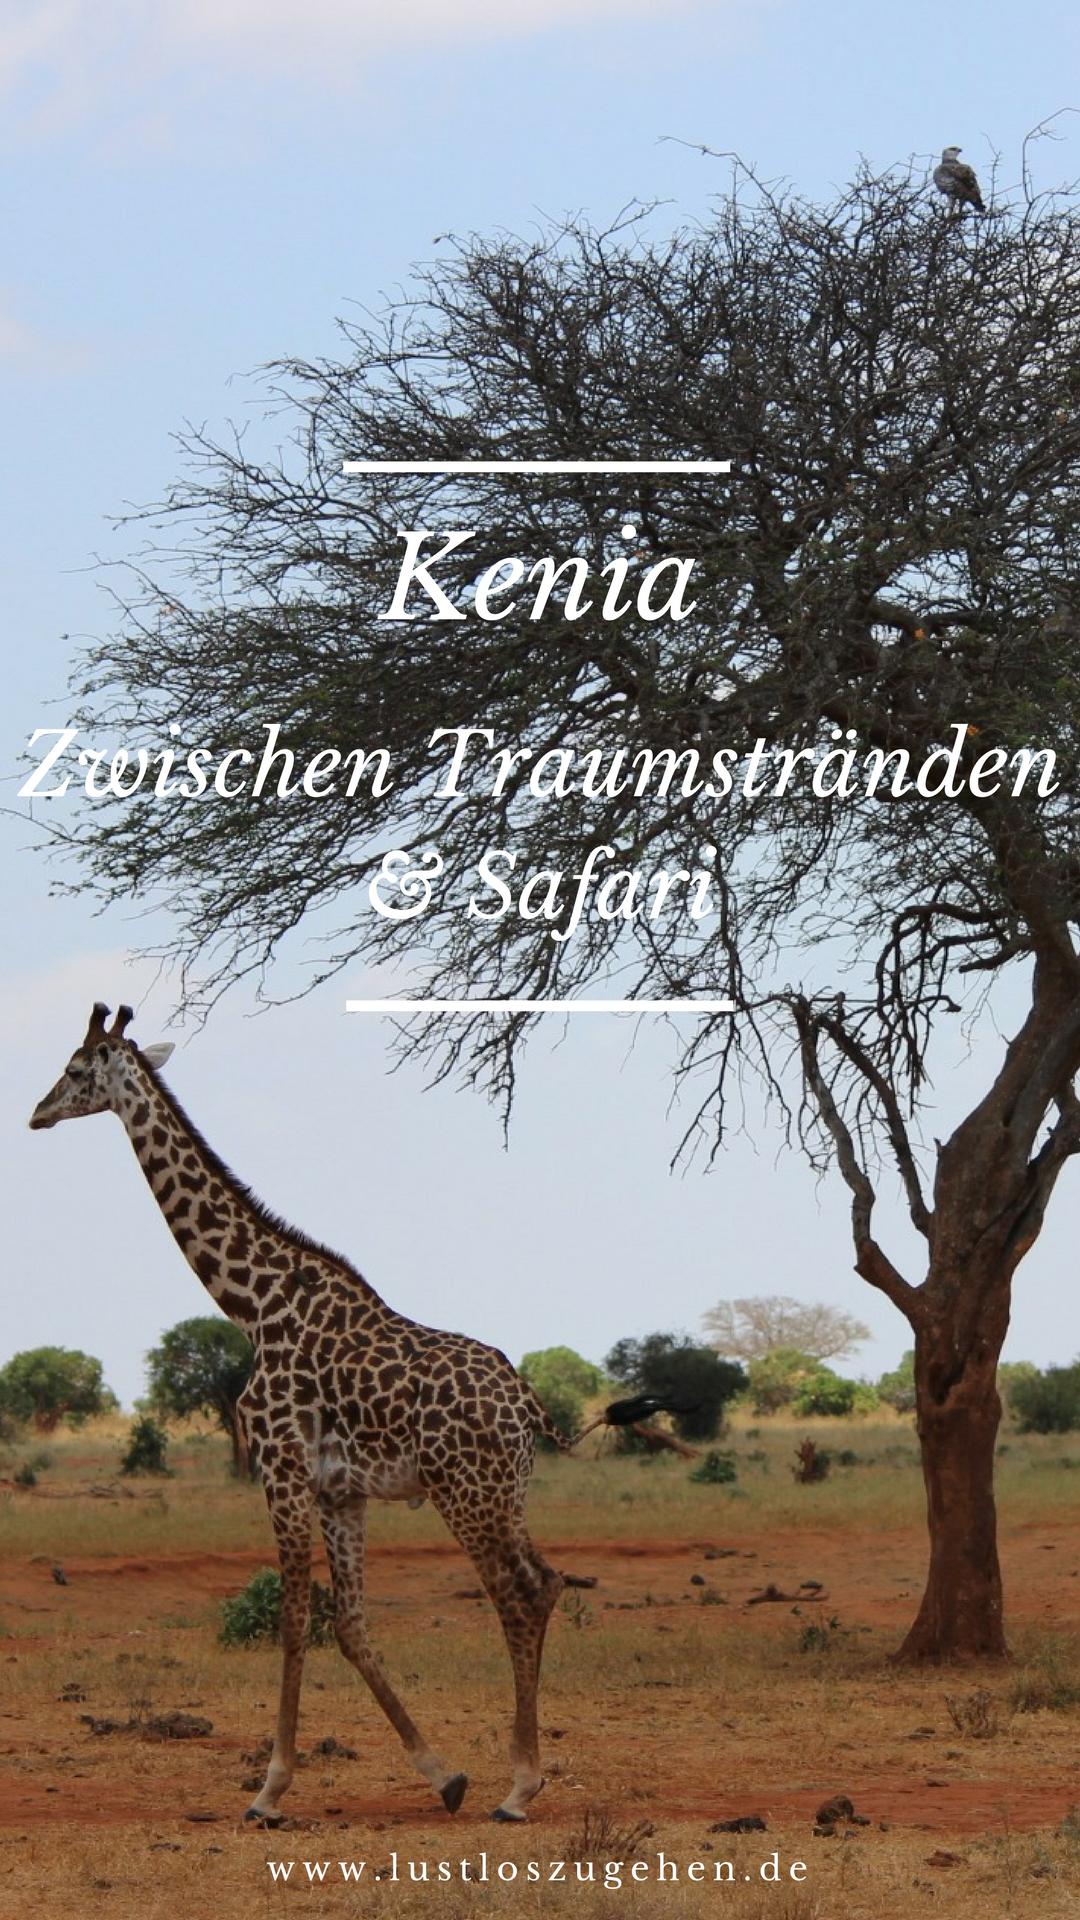 Kenia Safari Im Tsavo Nationalpark Weisse Traumstrande In Diani Beach Afrika Urlaub Afrika Reisen Kenia Urlaub